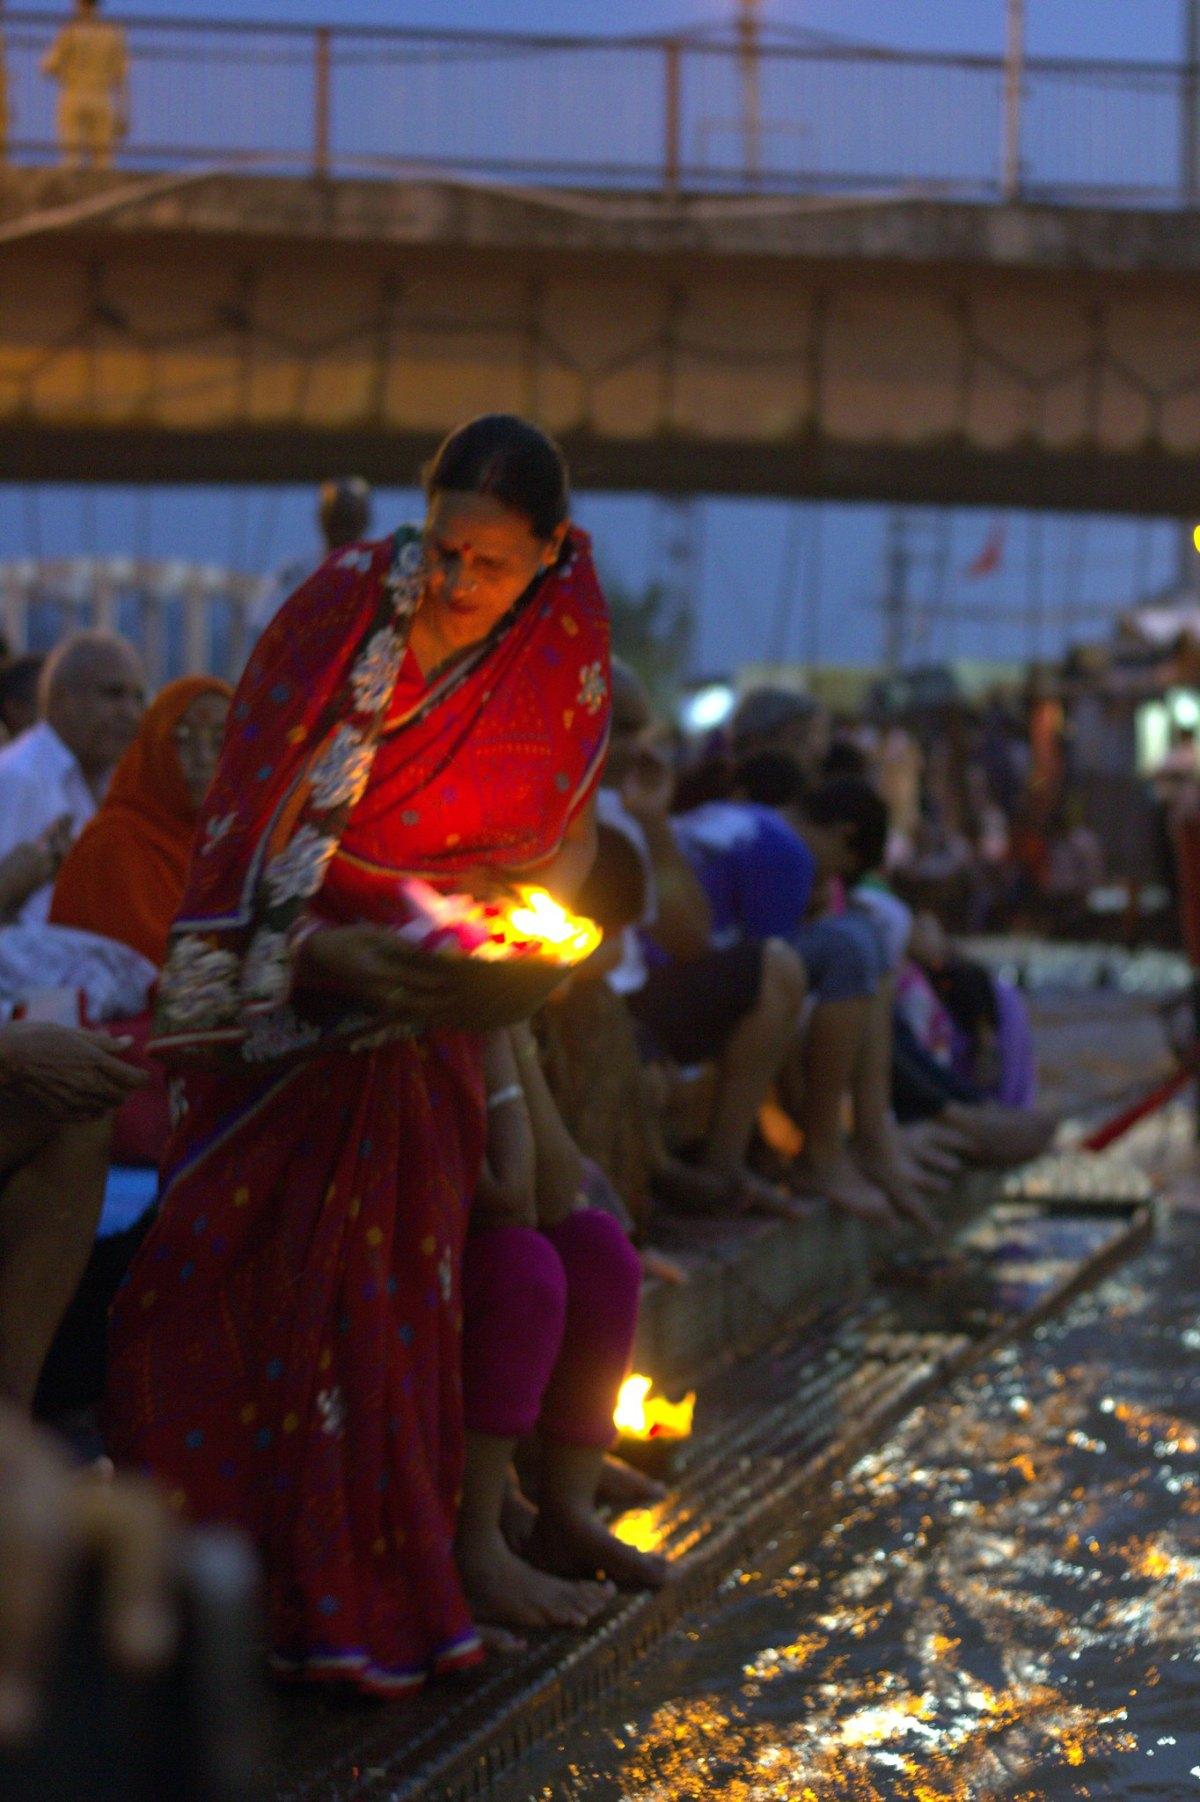 #uttarkhandtourism #haridwar #travelbloggerindia #travelblogindia